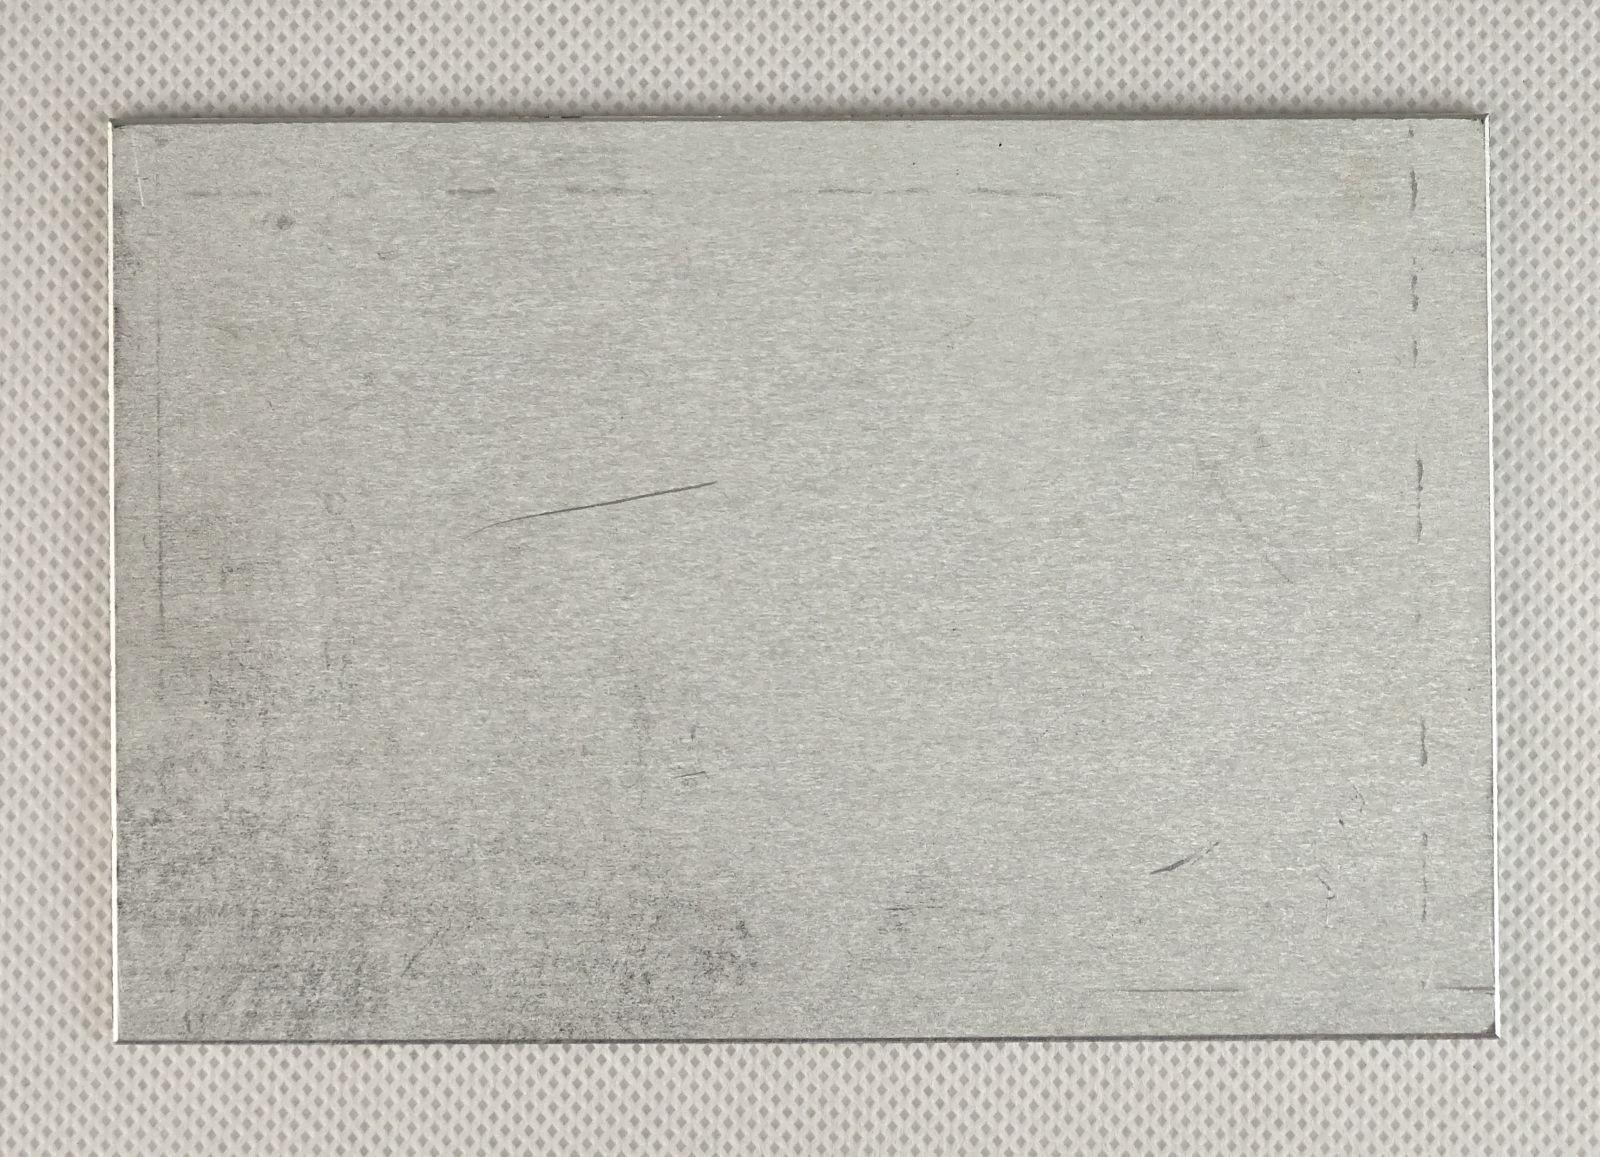 DSC02646.JPG (1600×1157)